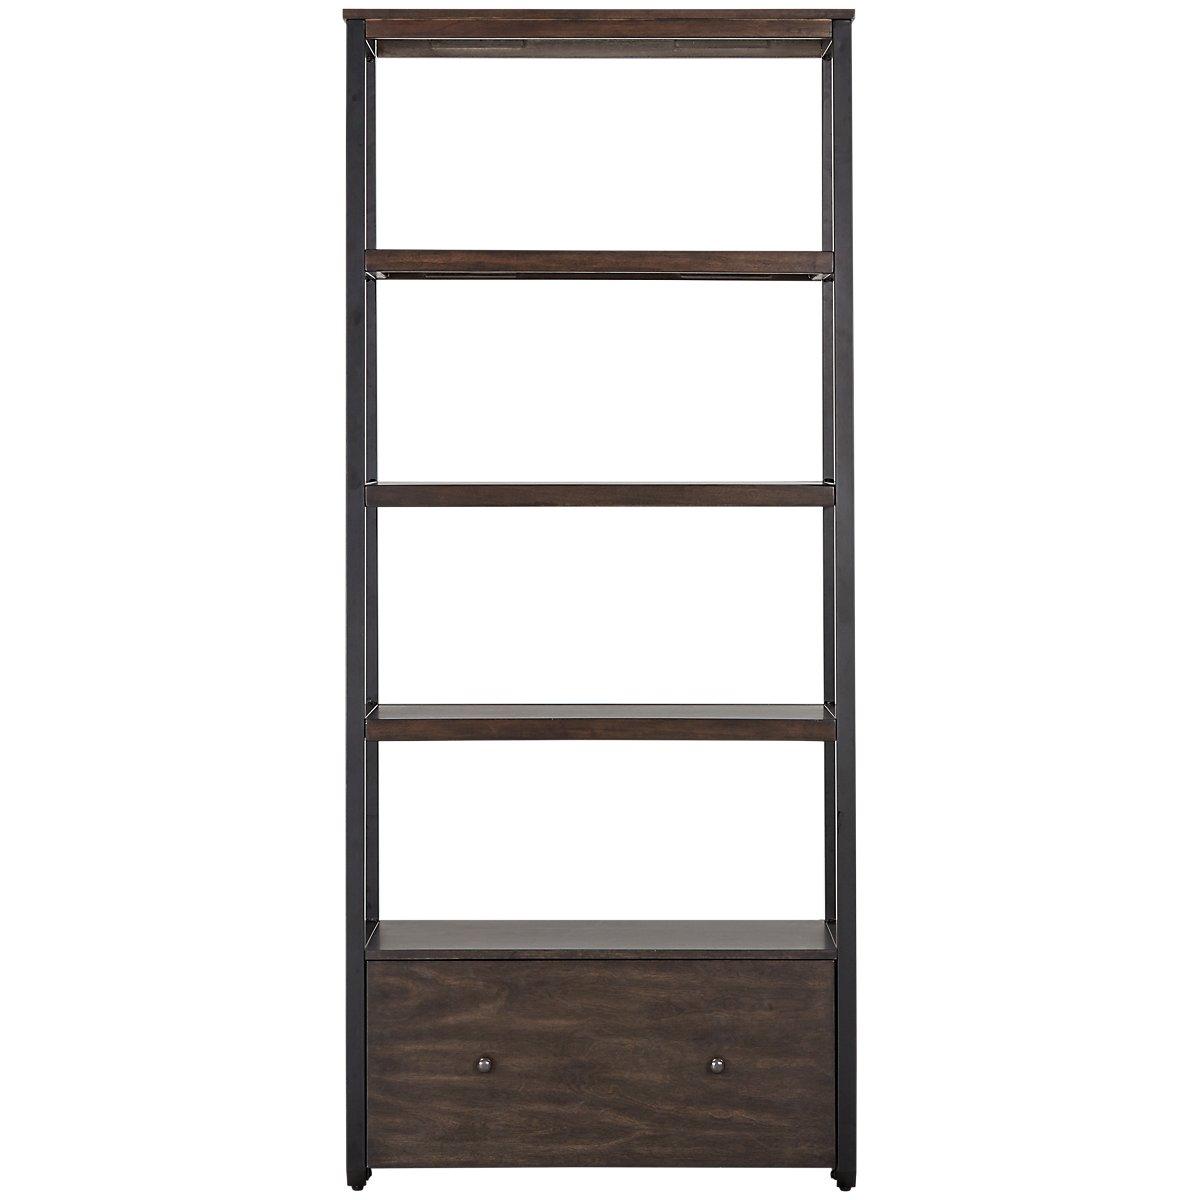 City furniture blaine dark tone bookcase for Blaine storage